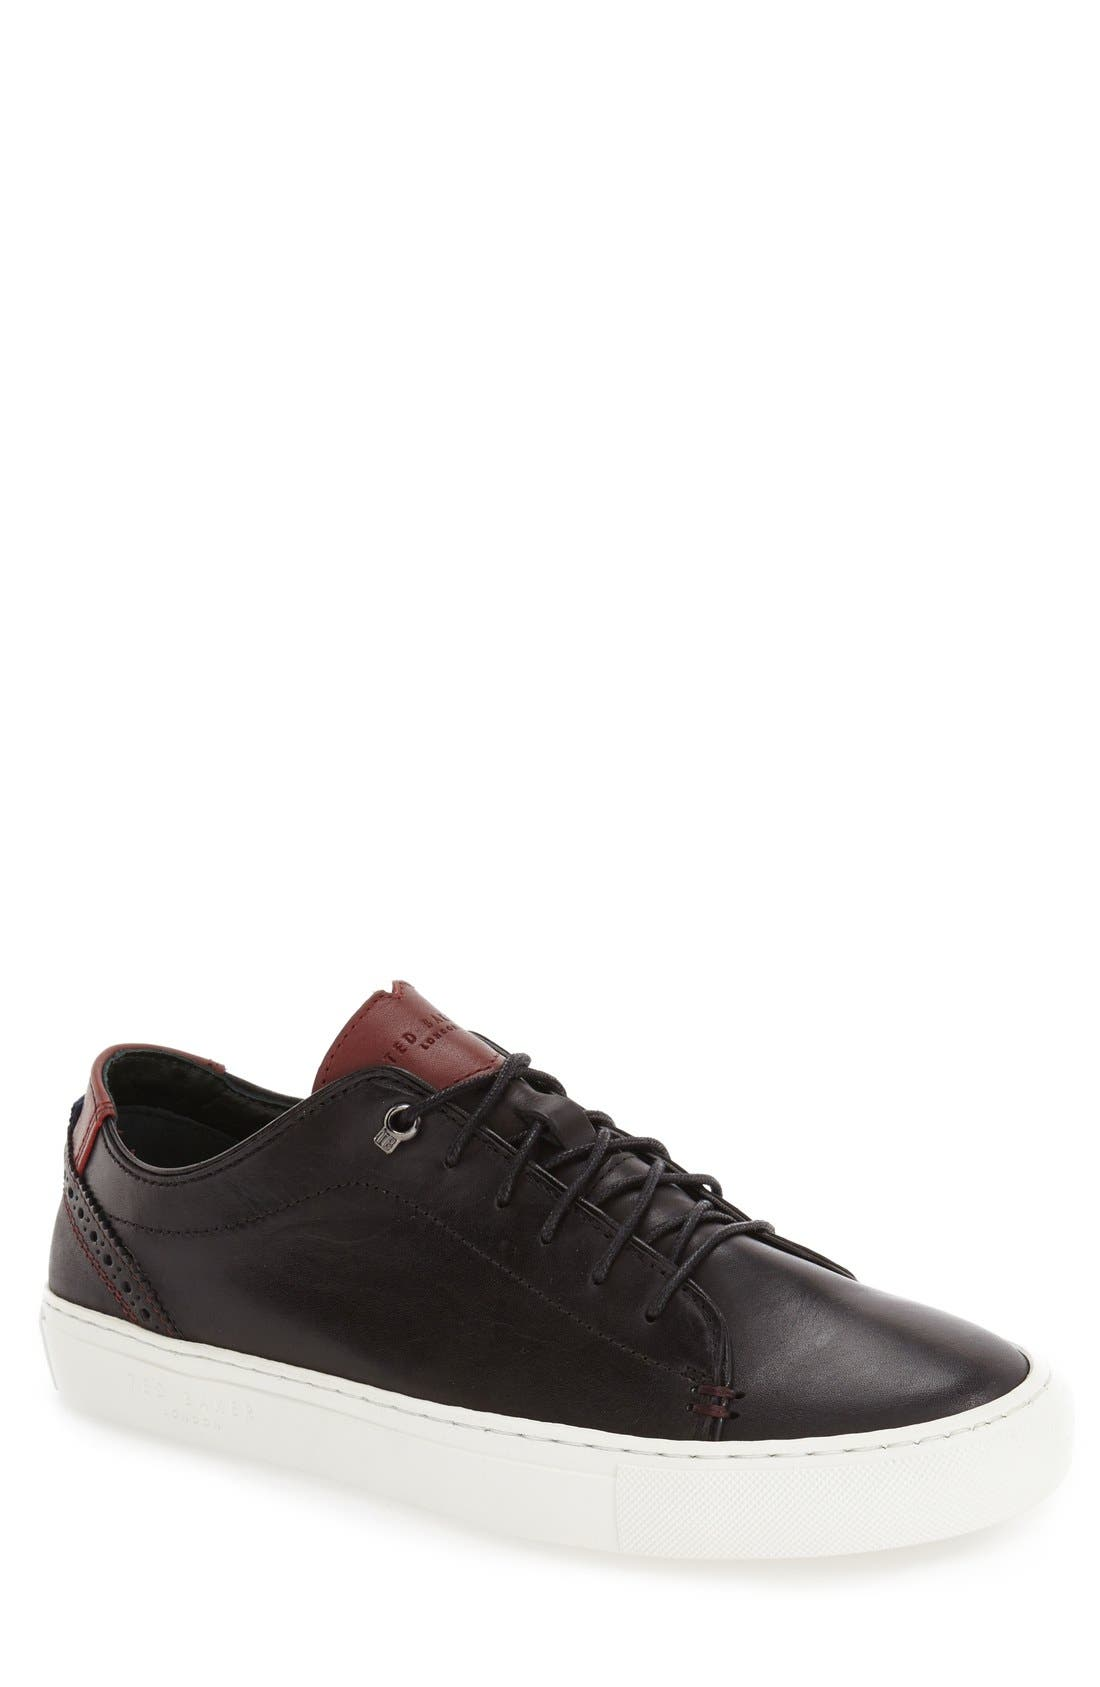 'Kiing Classic' Sneaker,                             Main thumbnail 1, color,                             001